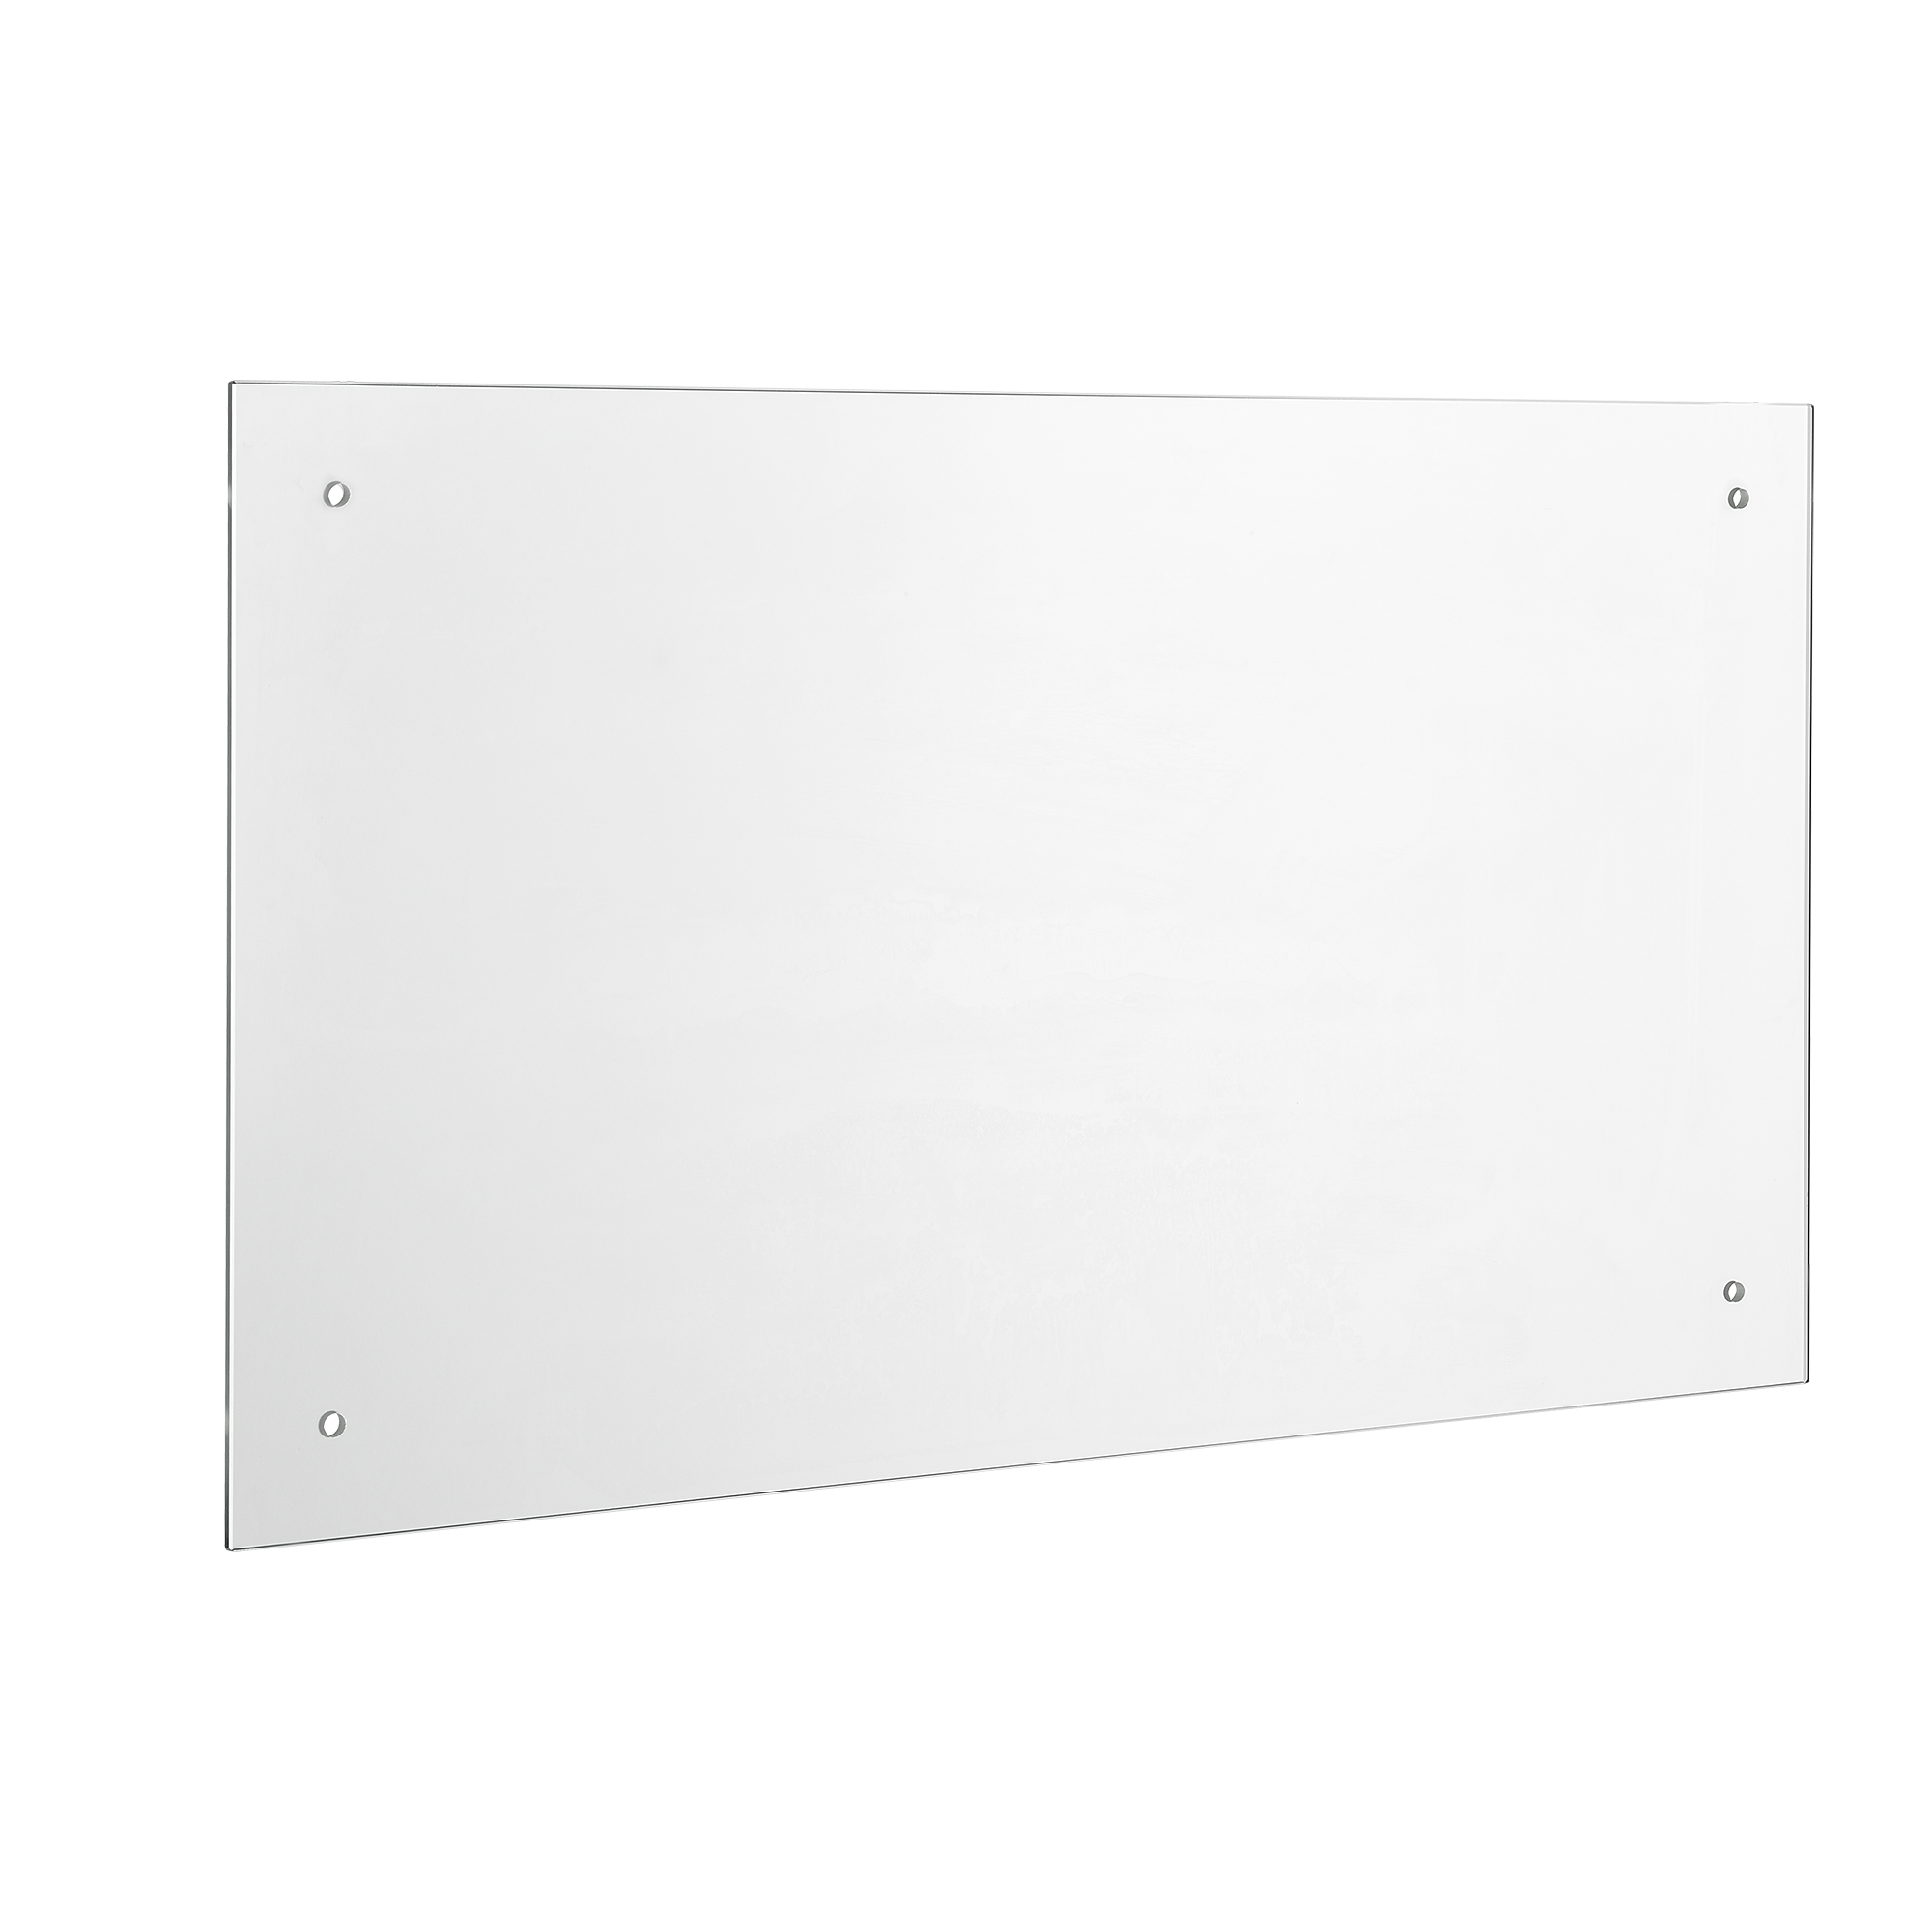 Panel de cristal para cocina 90x50cm pared sobre encimera - Panel pared cocina ...